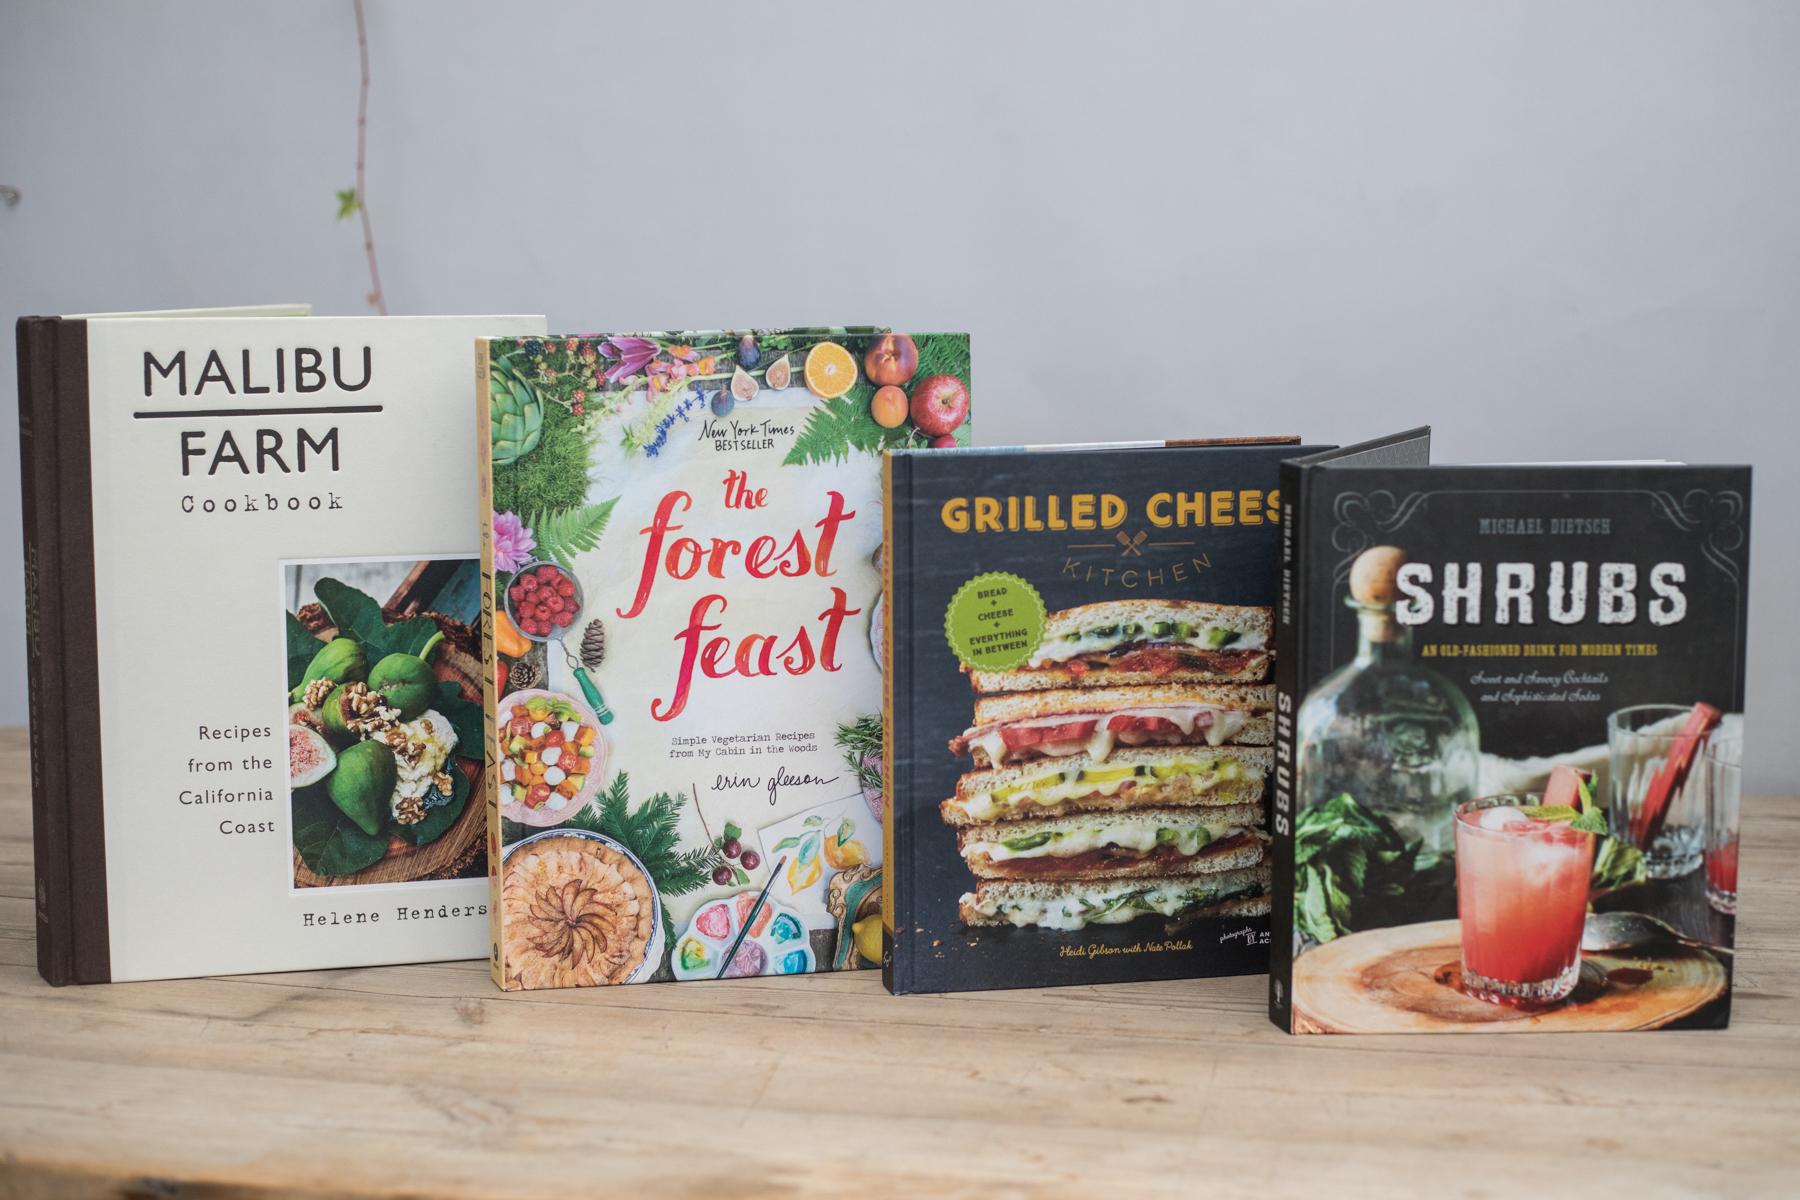 gourmet food rogers gardens cookbooks the forest feast malibu farm cookbook grilled cheese shrubs